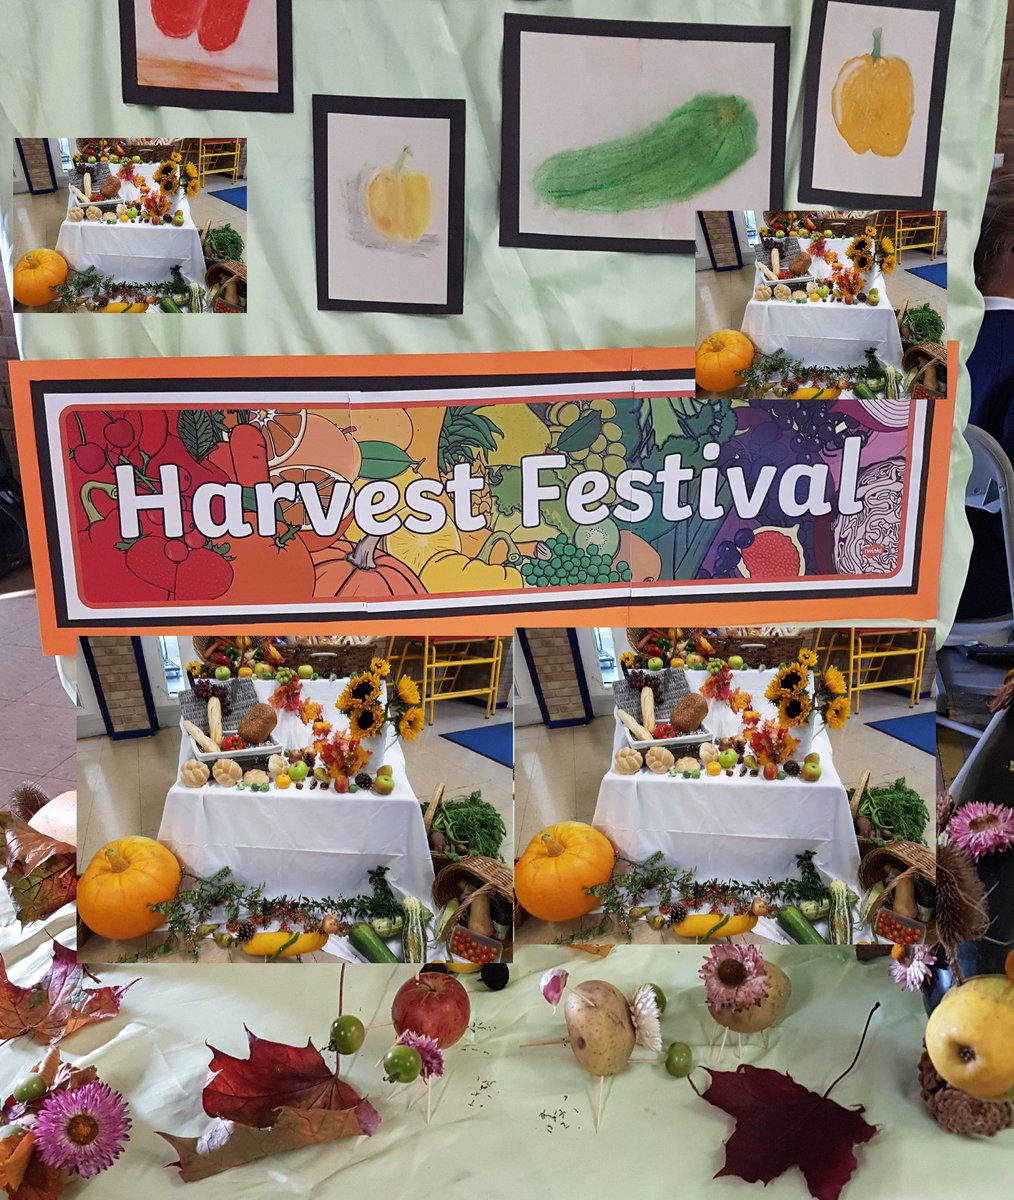 thankinggod for a great harvest at winslow ce school sharingiscaring elizabethadonupic twitter com xpsra8xib1